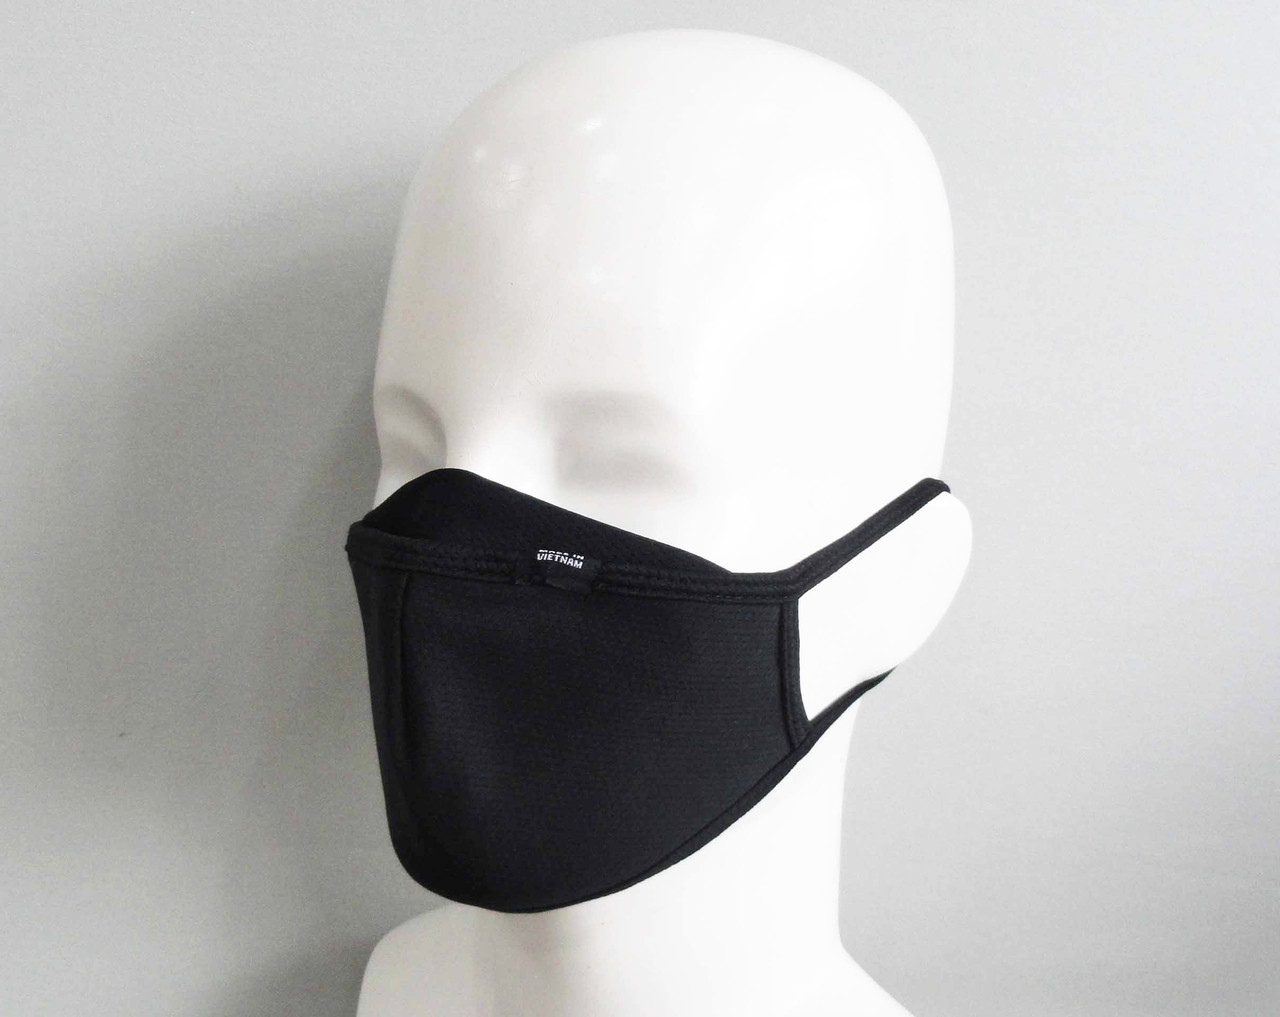 Black 3 layer Face mask - Side